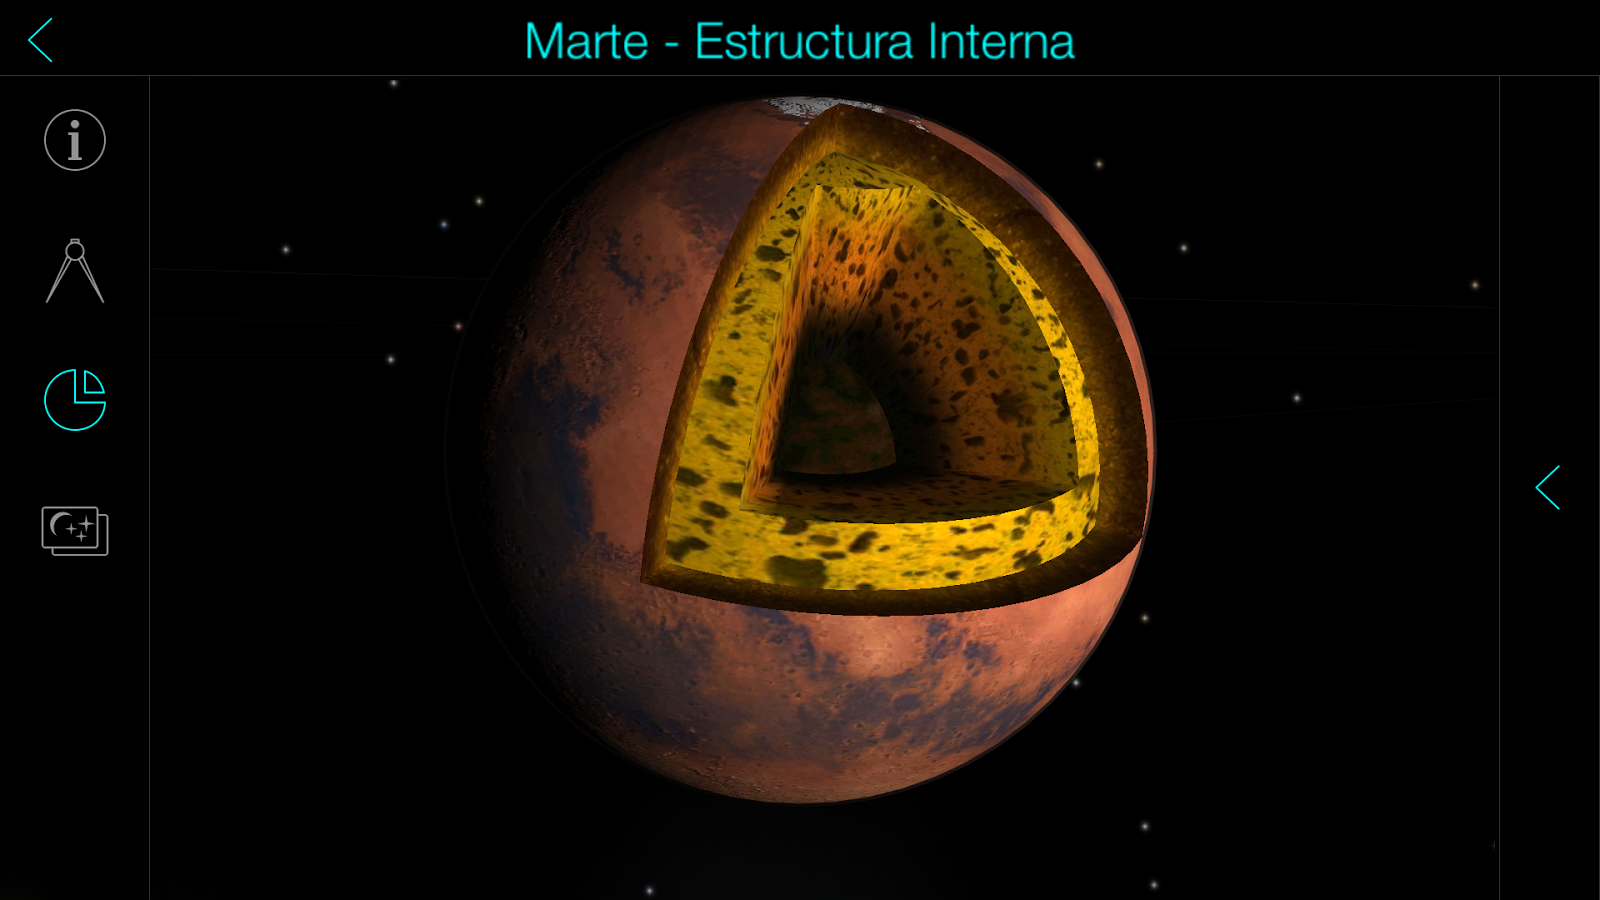 Solar walk free planetario 3d planetas estrellas for Immagini universo gratis